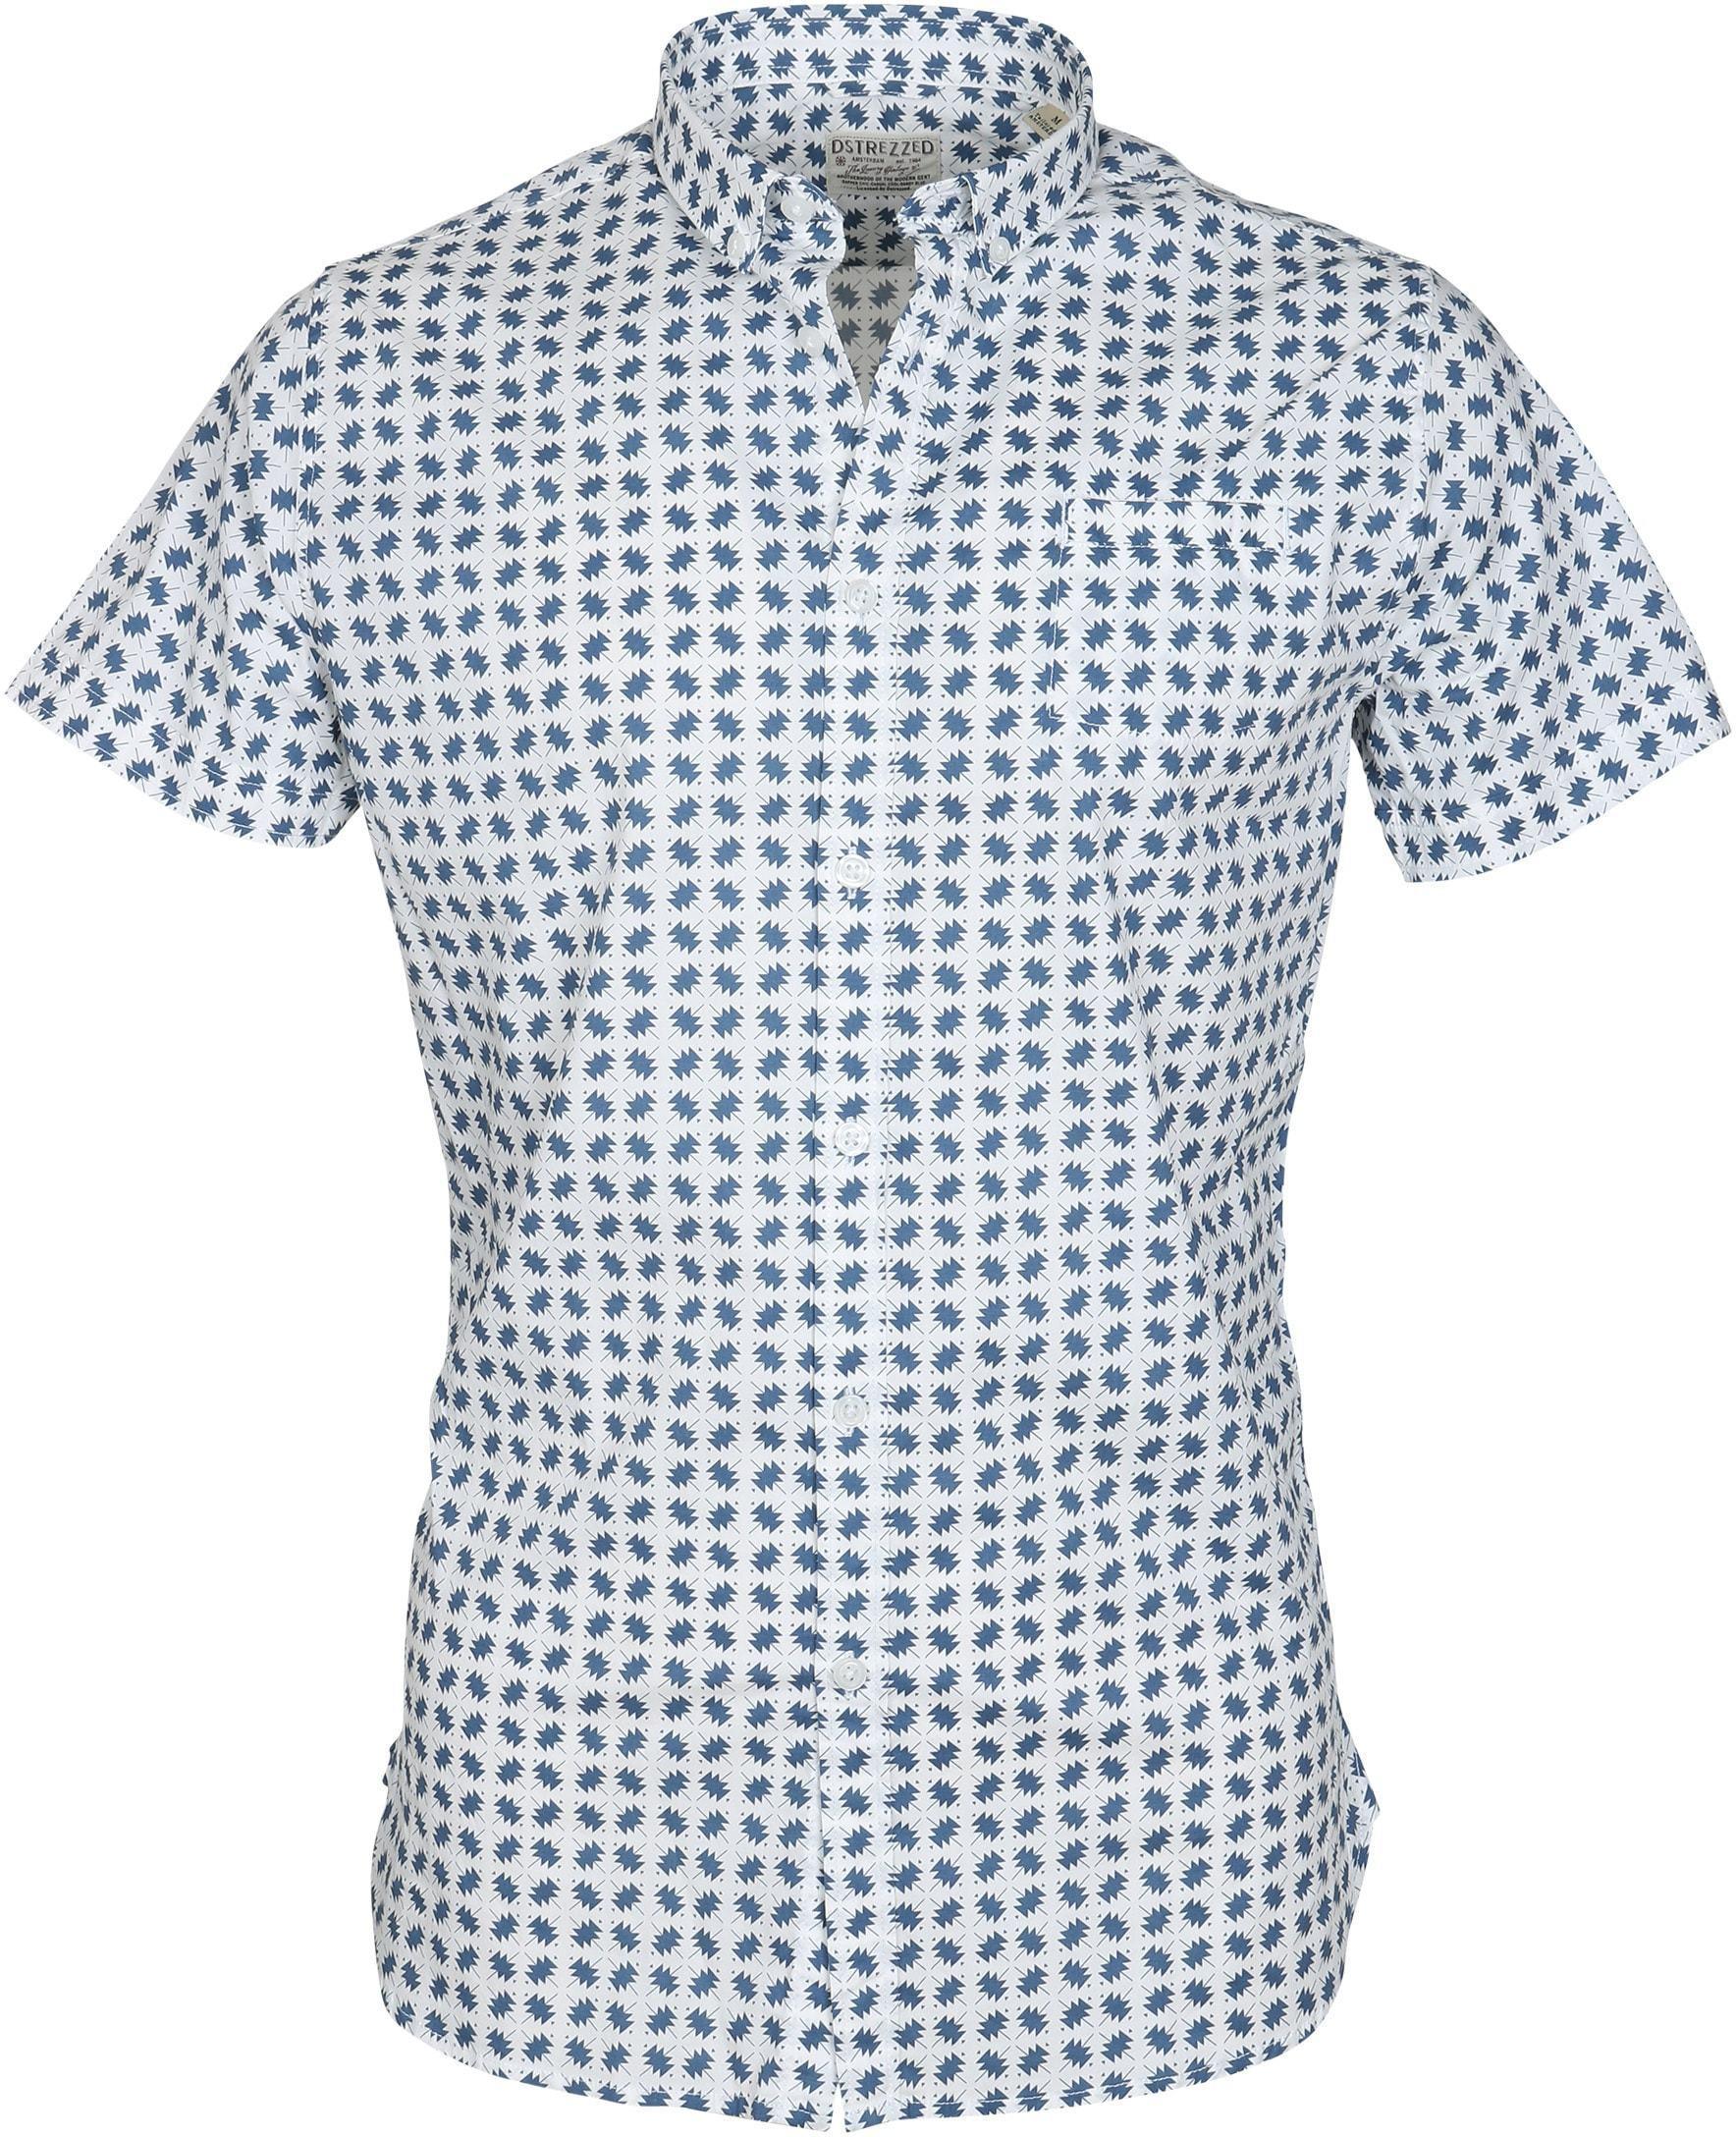 DStrezzed SS Overhemd Blauw Dessin foto 0